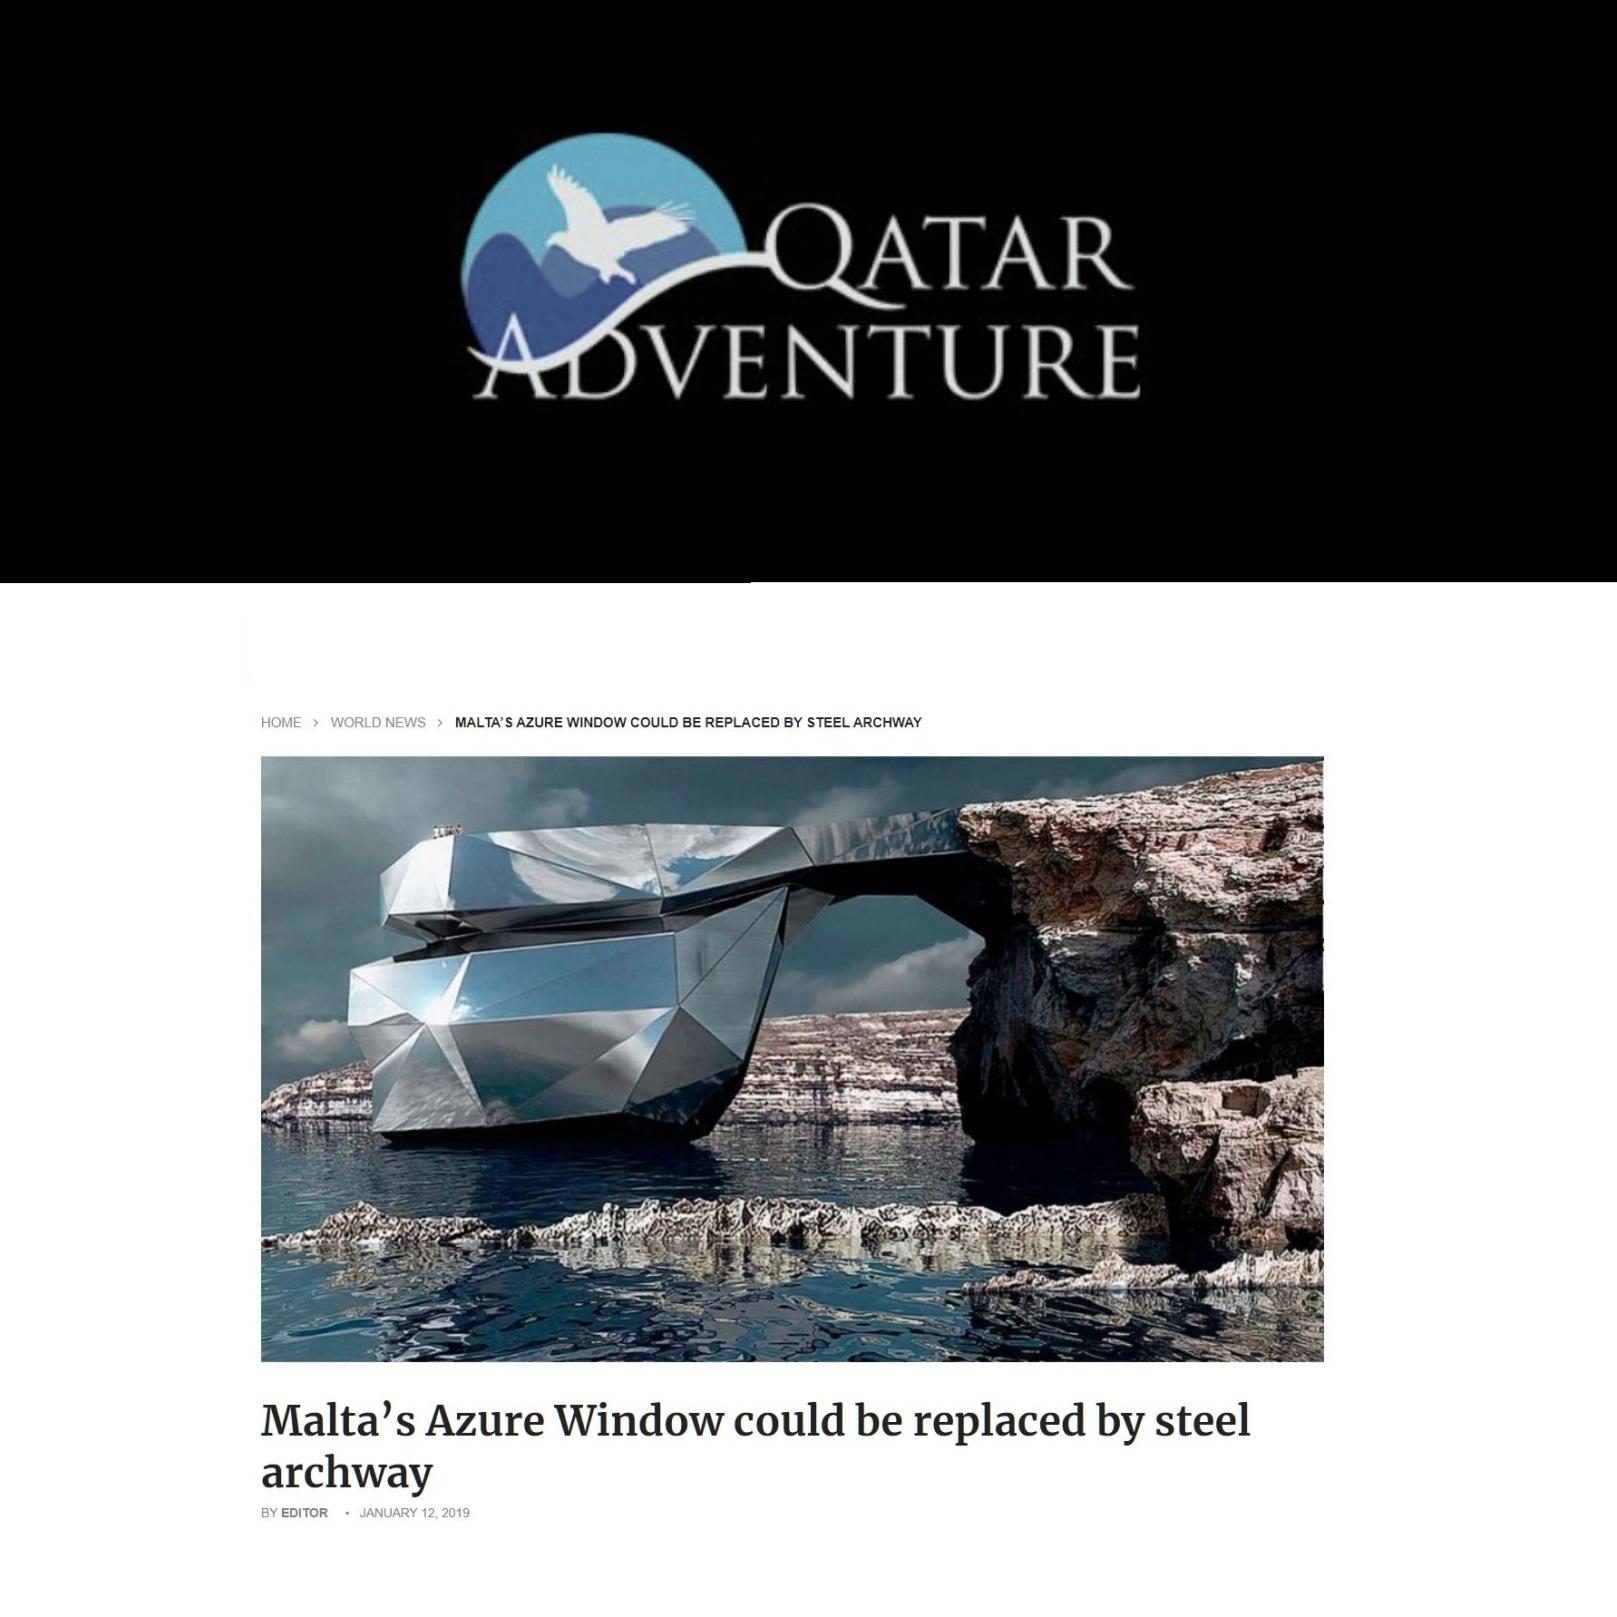 Qatar Adventure